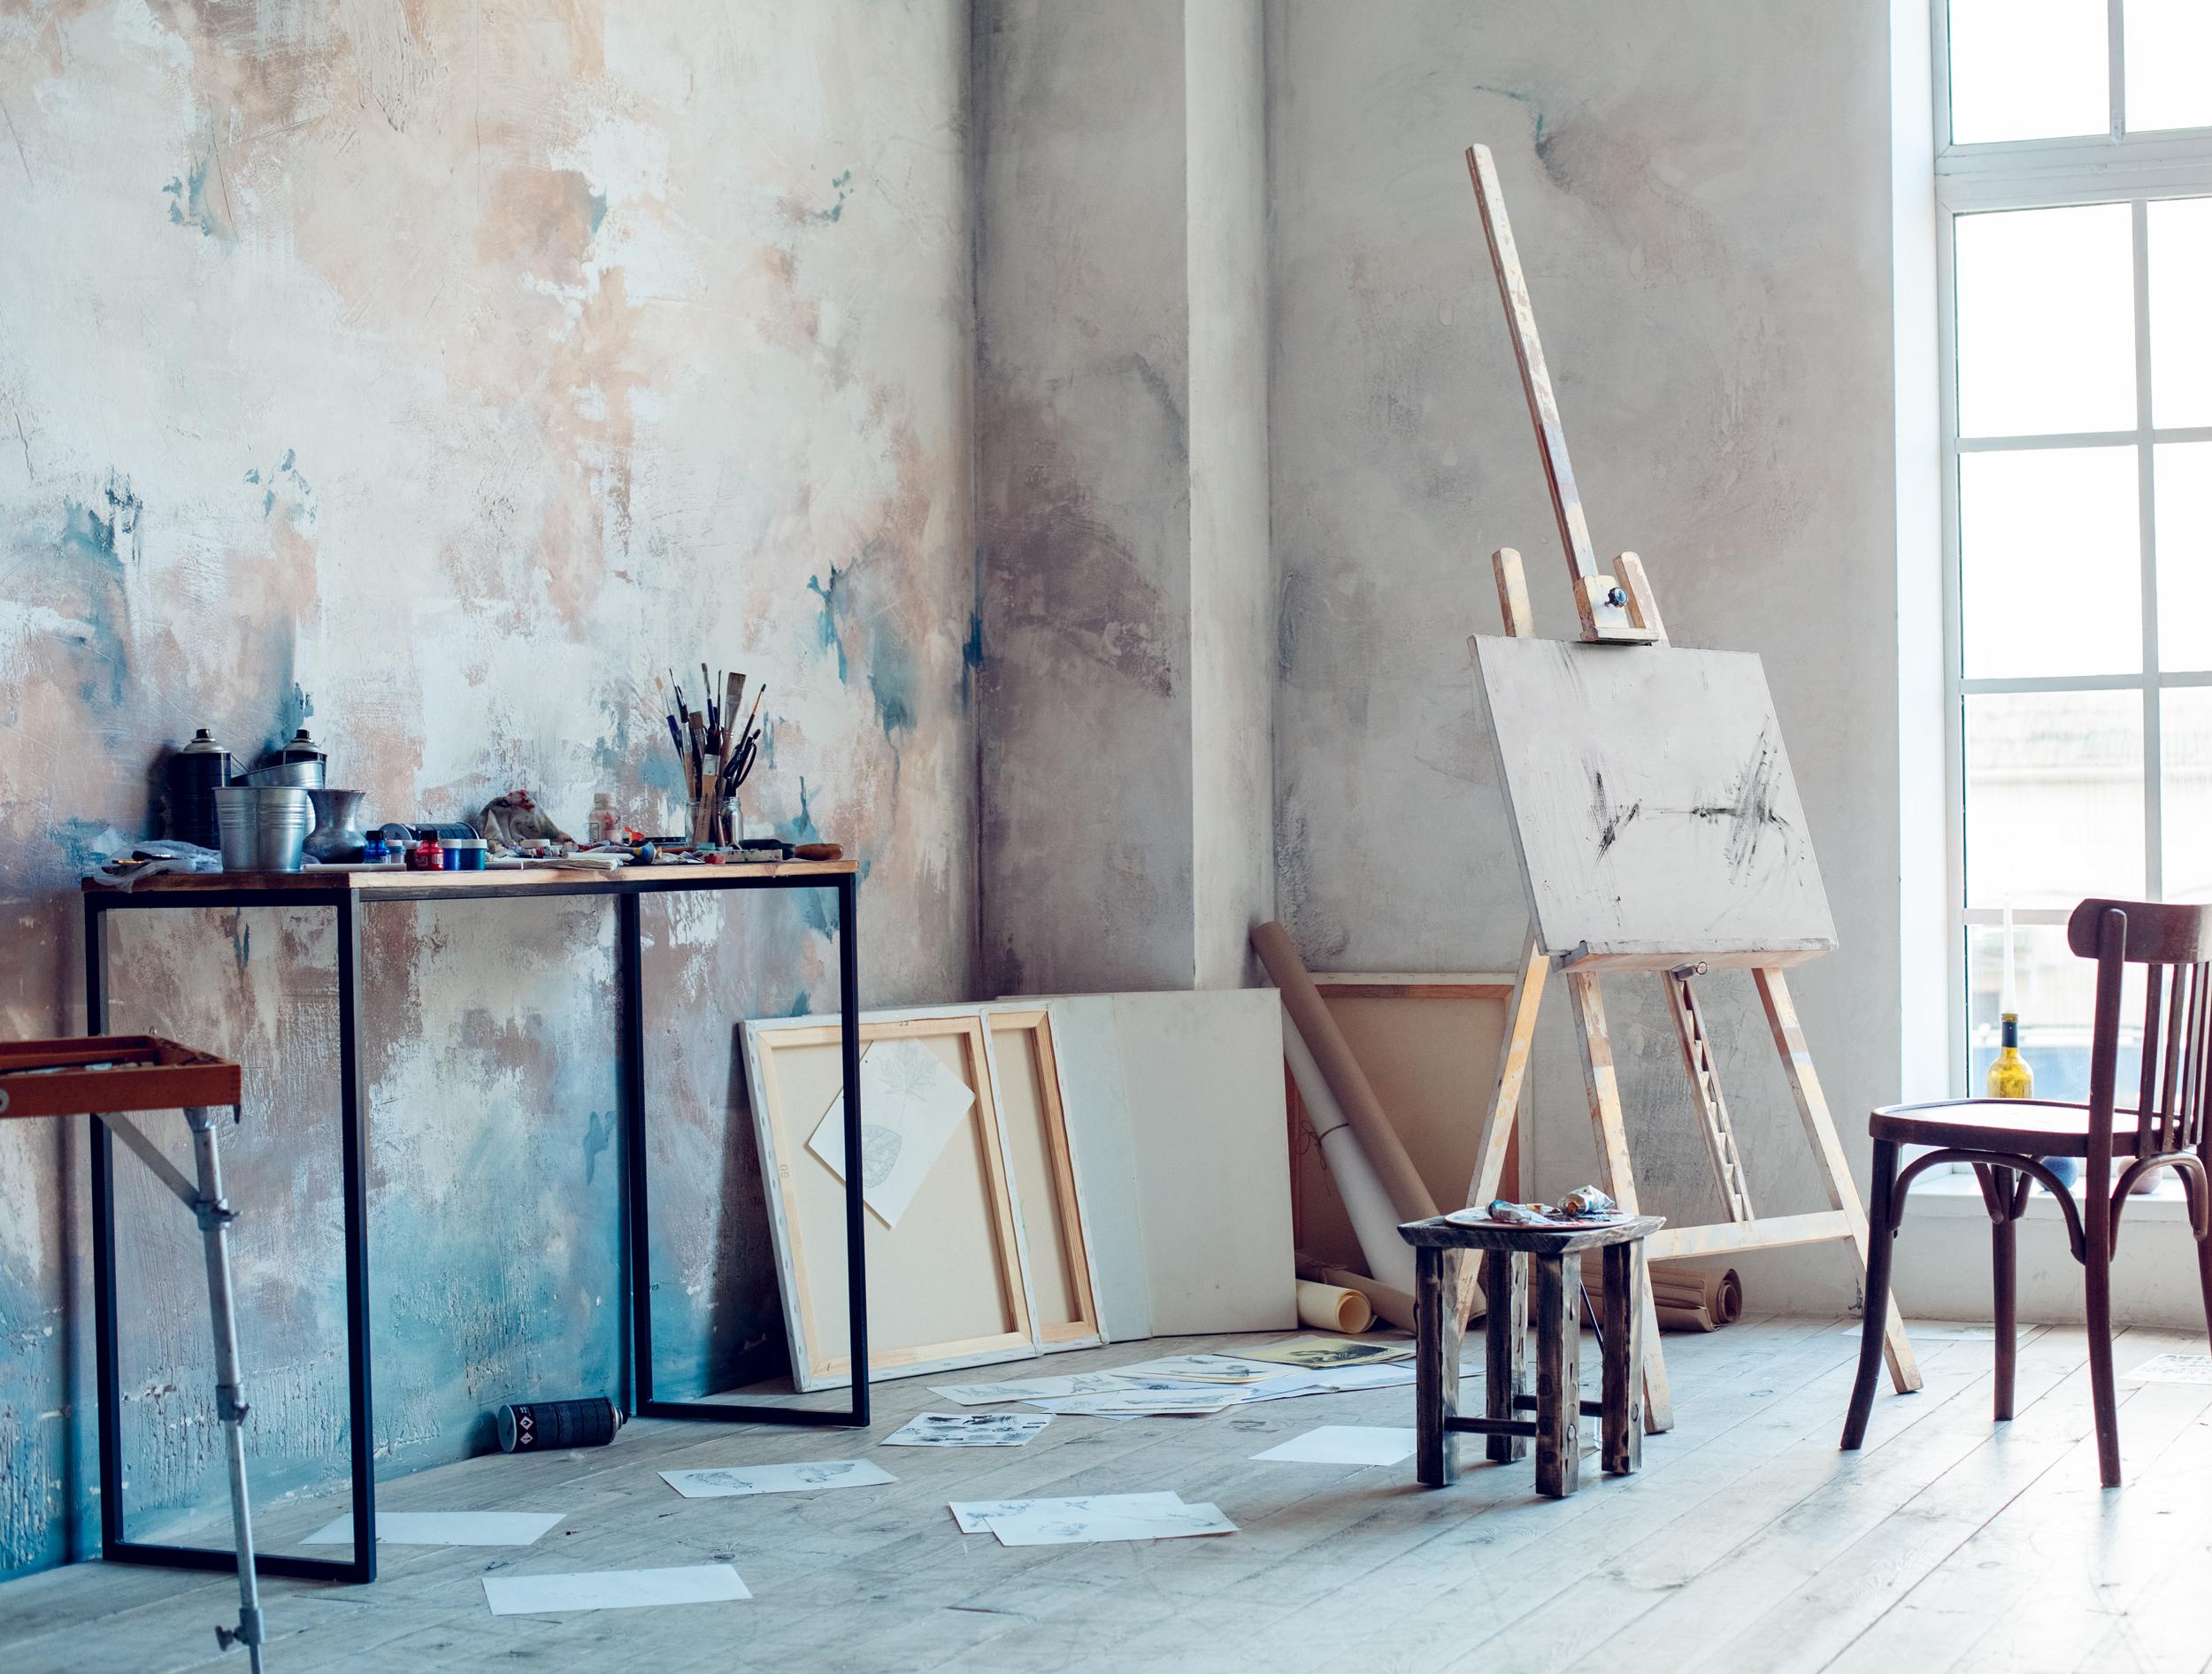 Konst, tryck & barntavlor